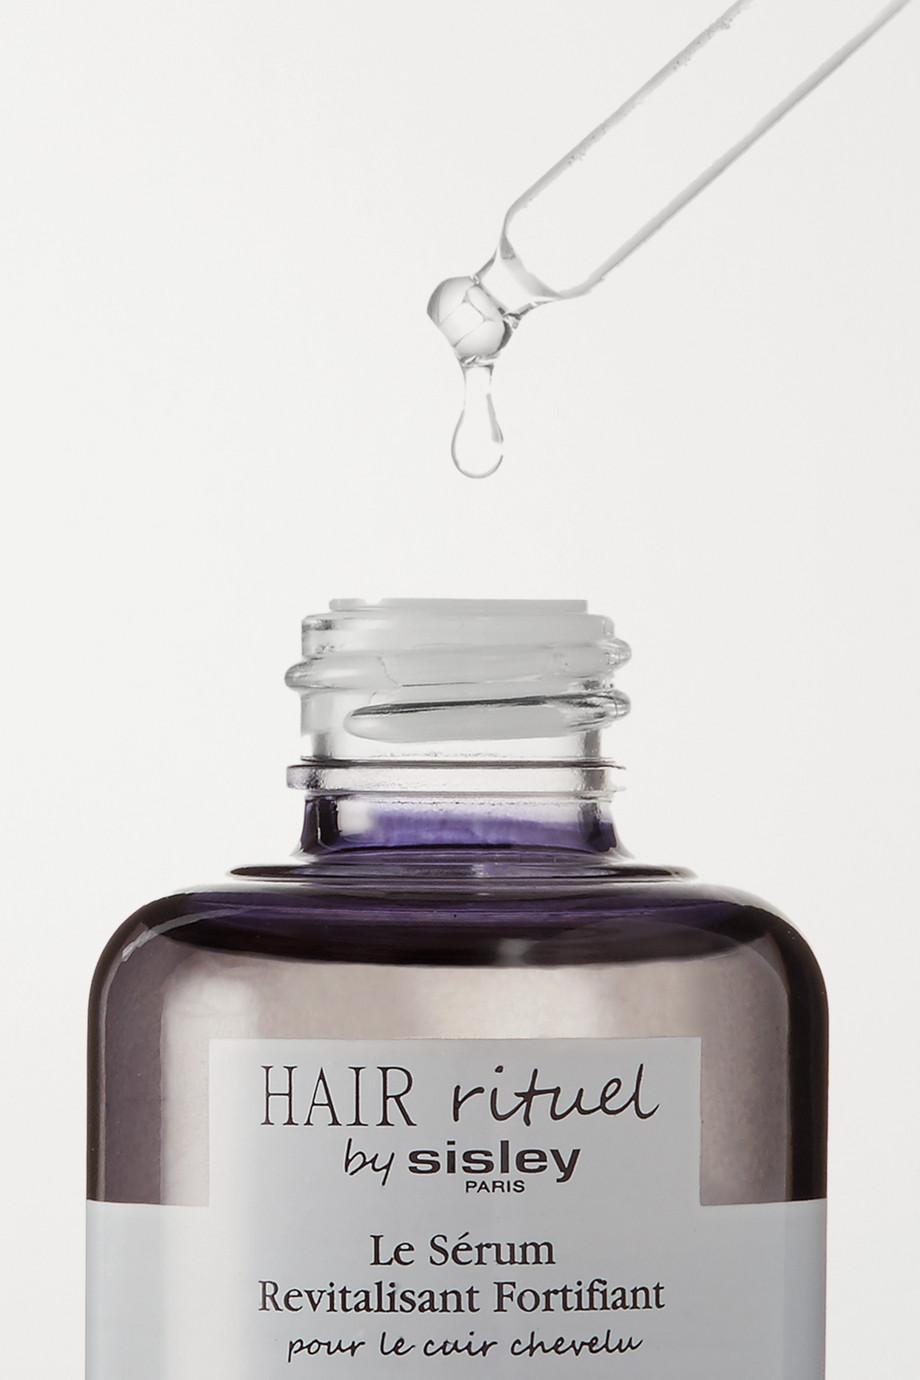 HAIR rituel by Sisley Sérum revitalisant fortifiant pour le cuir chevelu, 60 ml